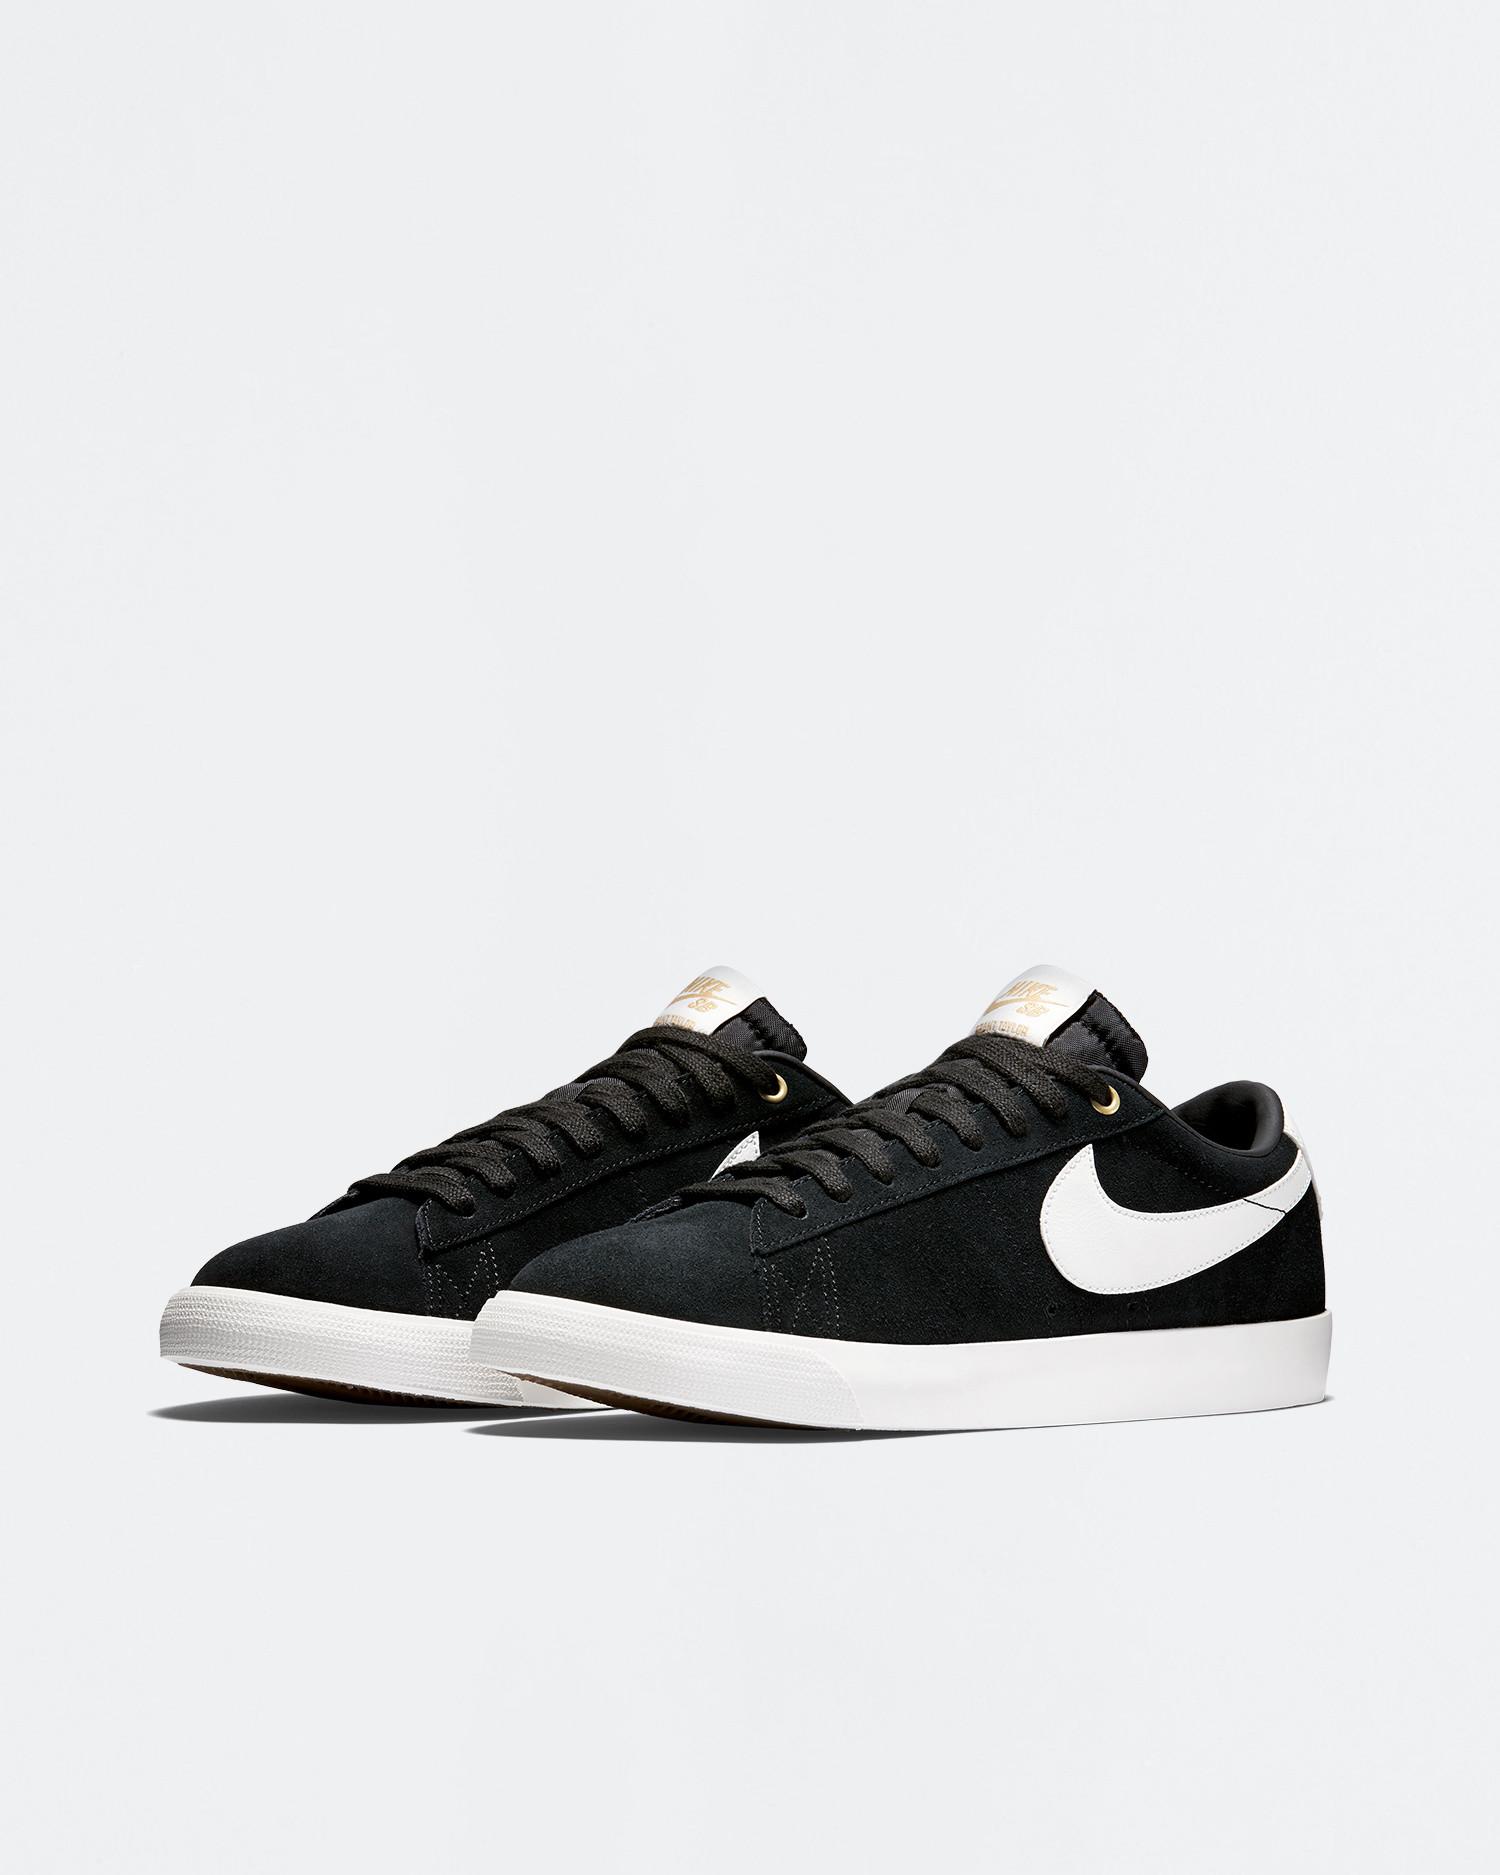 Nike SB Blazer Low Gt Black/Sail